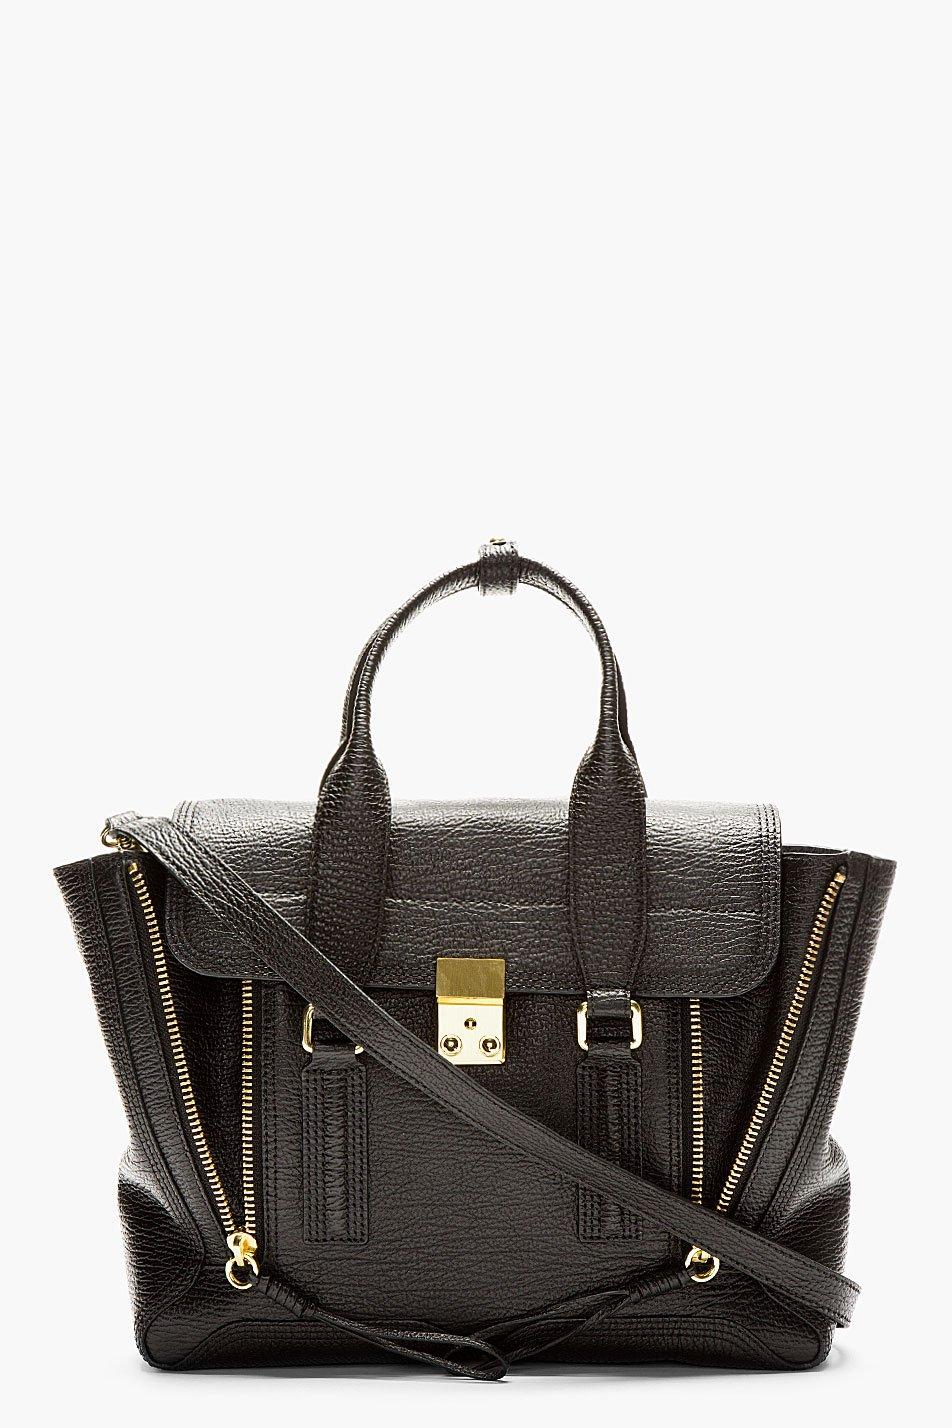 3.1 phillip lim black textured leather pashli medium satchel